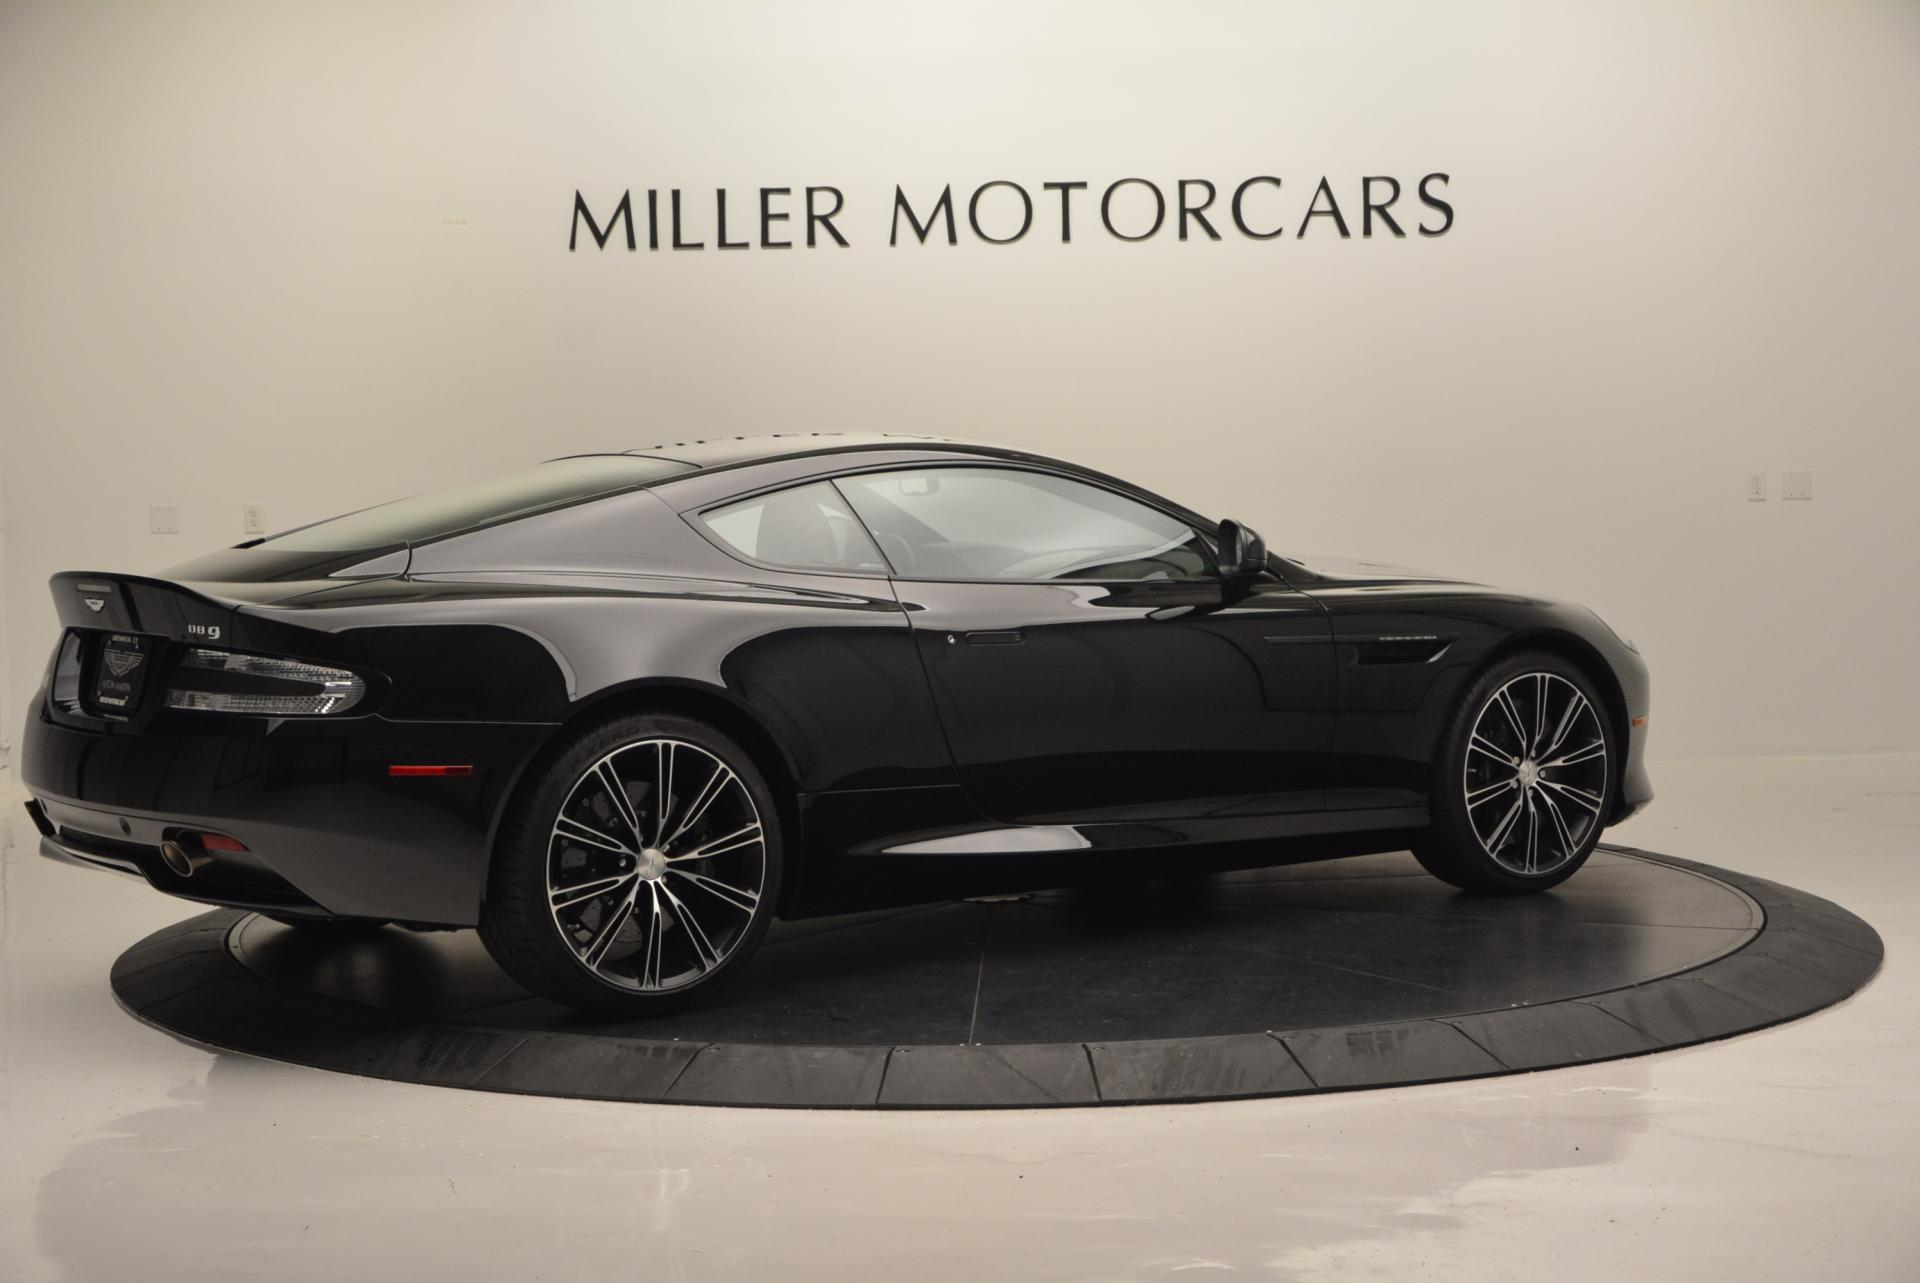 Used 2015 Aston Martin DB9 Carbon Edition For Sale In Greenwich, CT. Alfa Romeo of Greenwich, 7349 528_p8